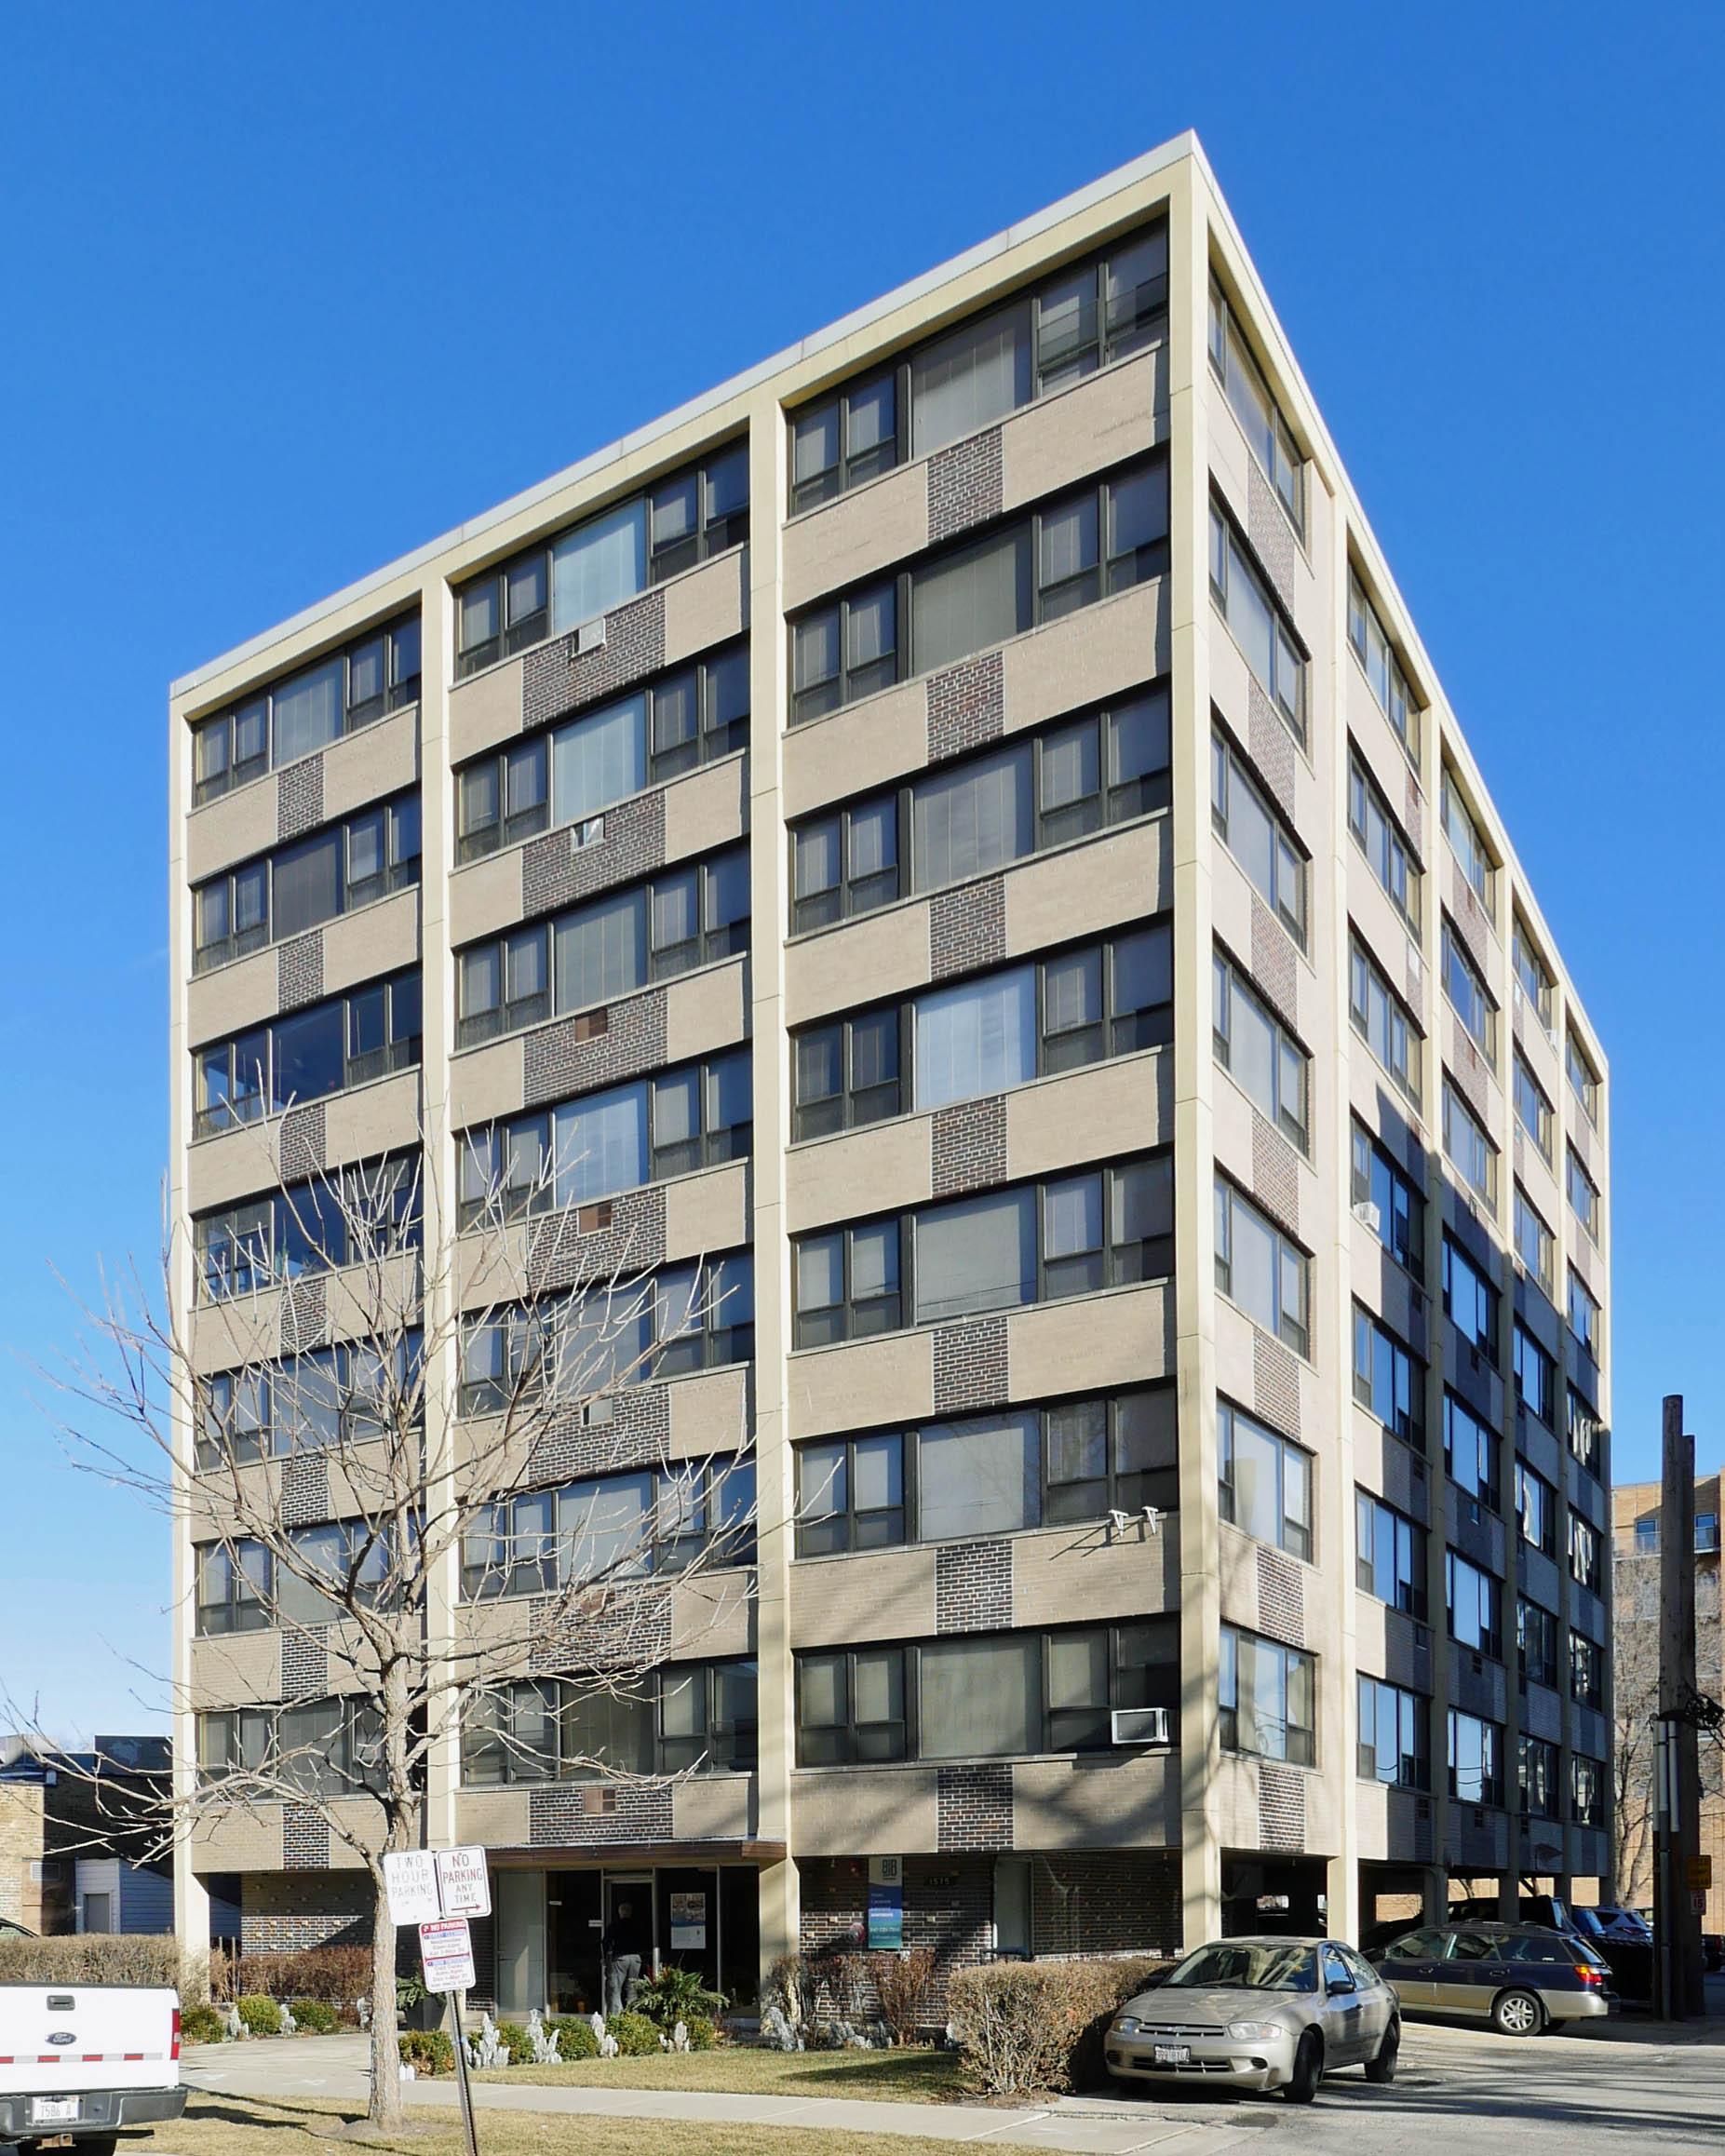 Evanston apartment review, 1575 Oak Ave – YoChicago